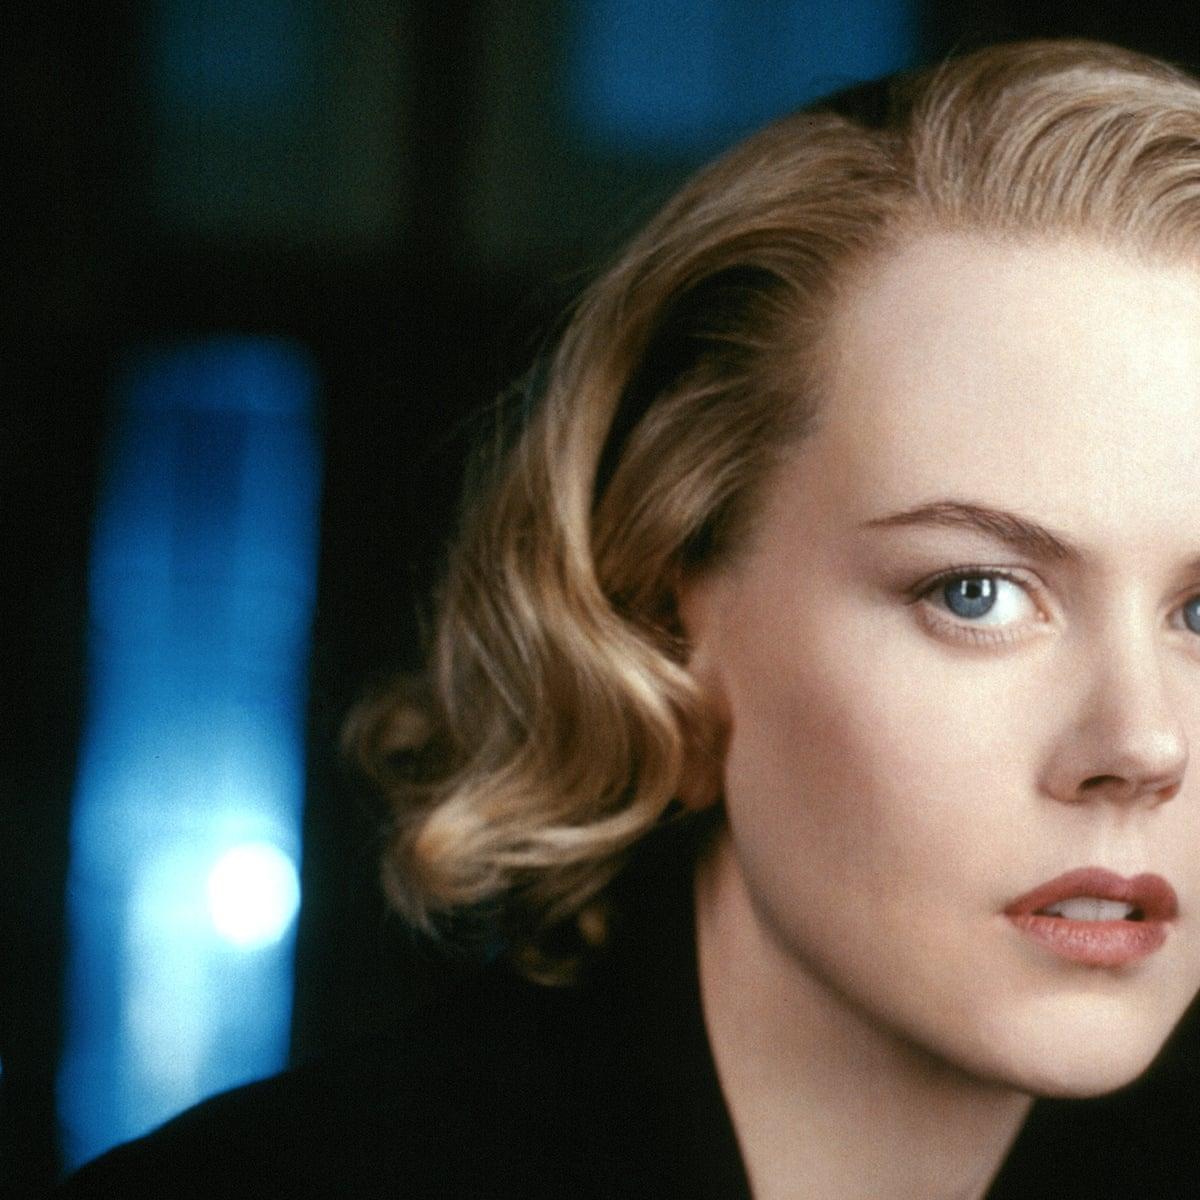 Nicole Kidman S Top 10 Films Ranked Film The Guardian